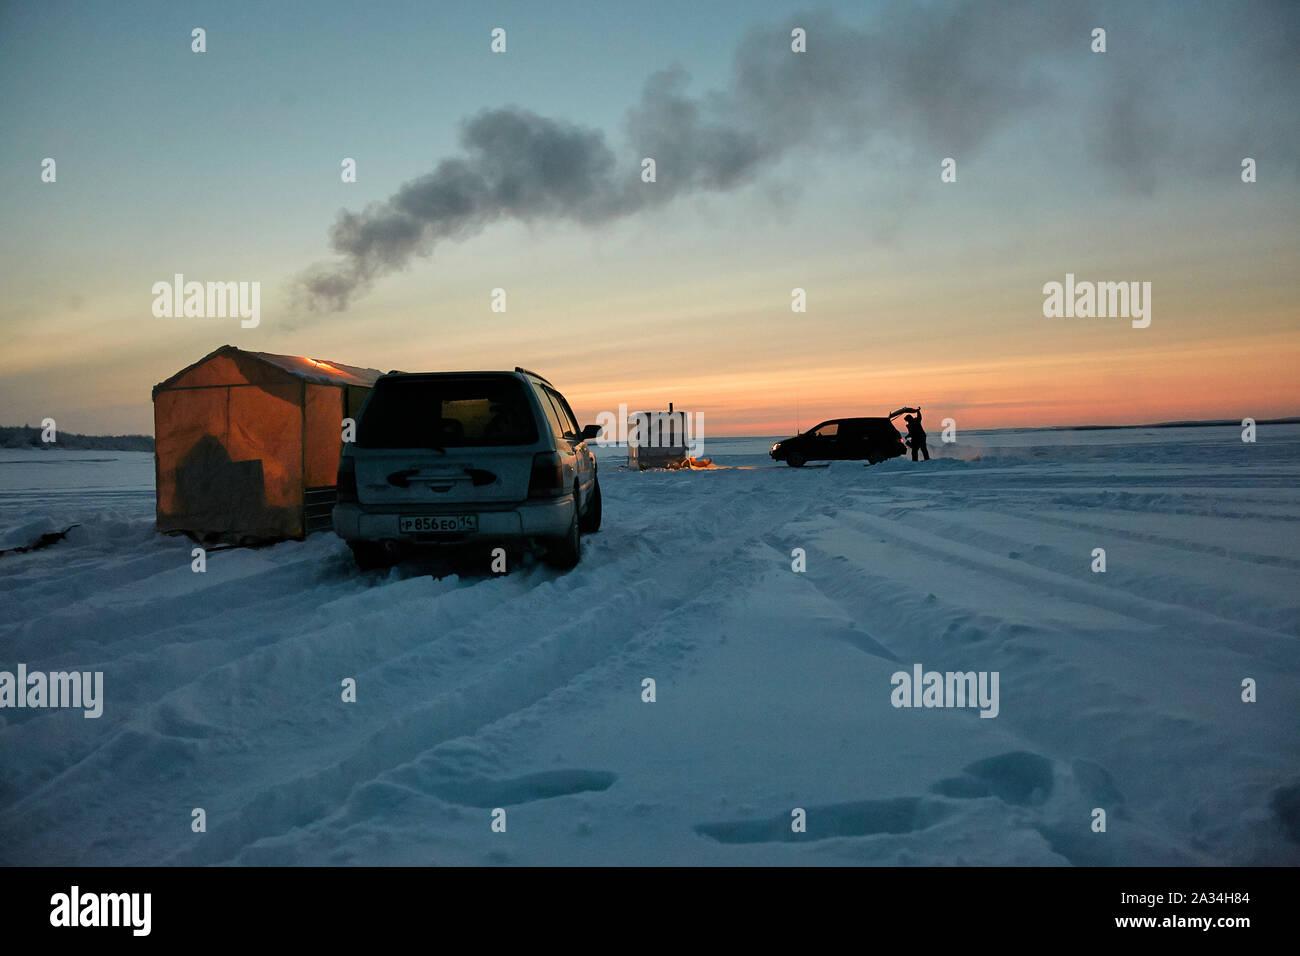 Russia Yakutsk Lena  Simeon Jegorov (53)  fishing on Ice with car and small house -45 degrees celcius  3-02-2013 photo: Jaco Klamer Stock Photo